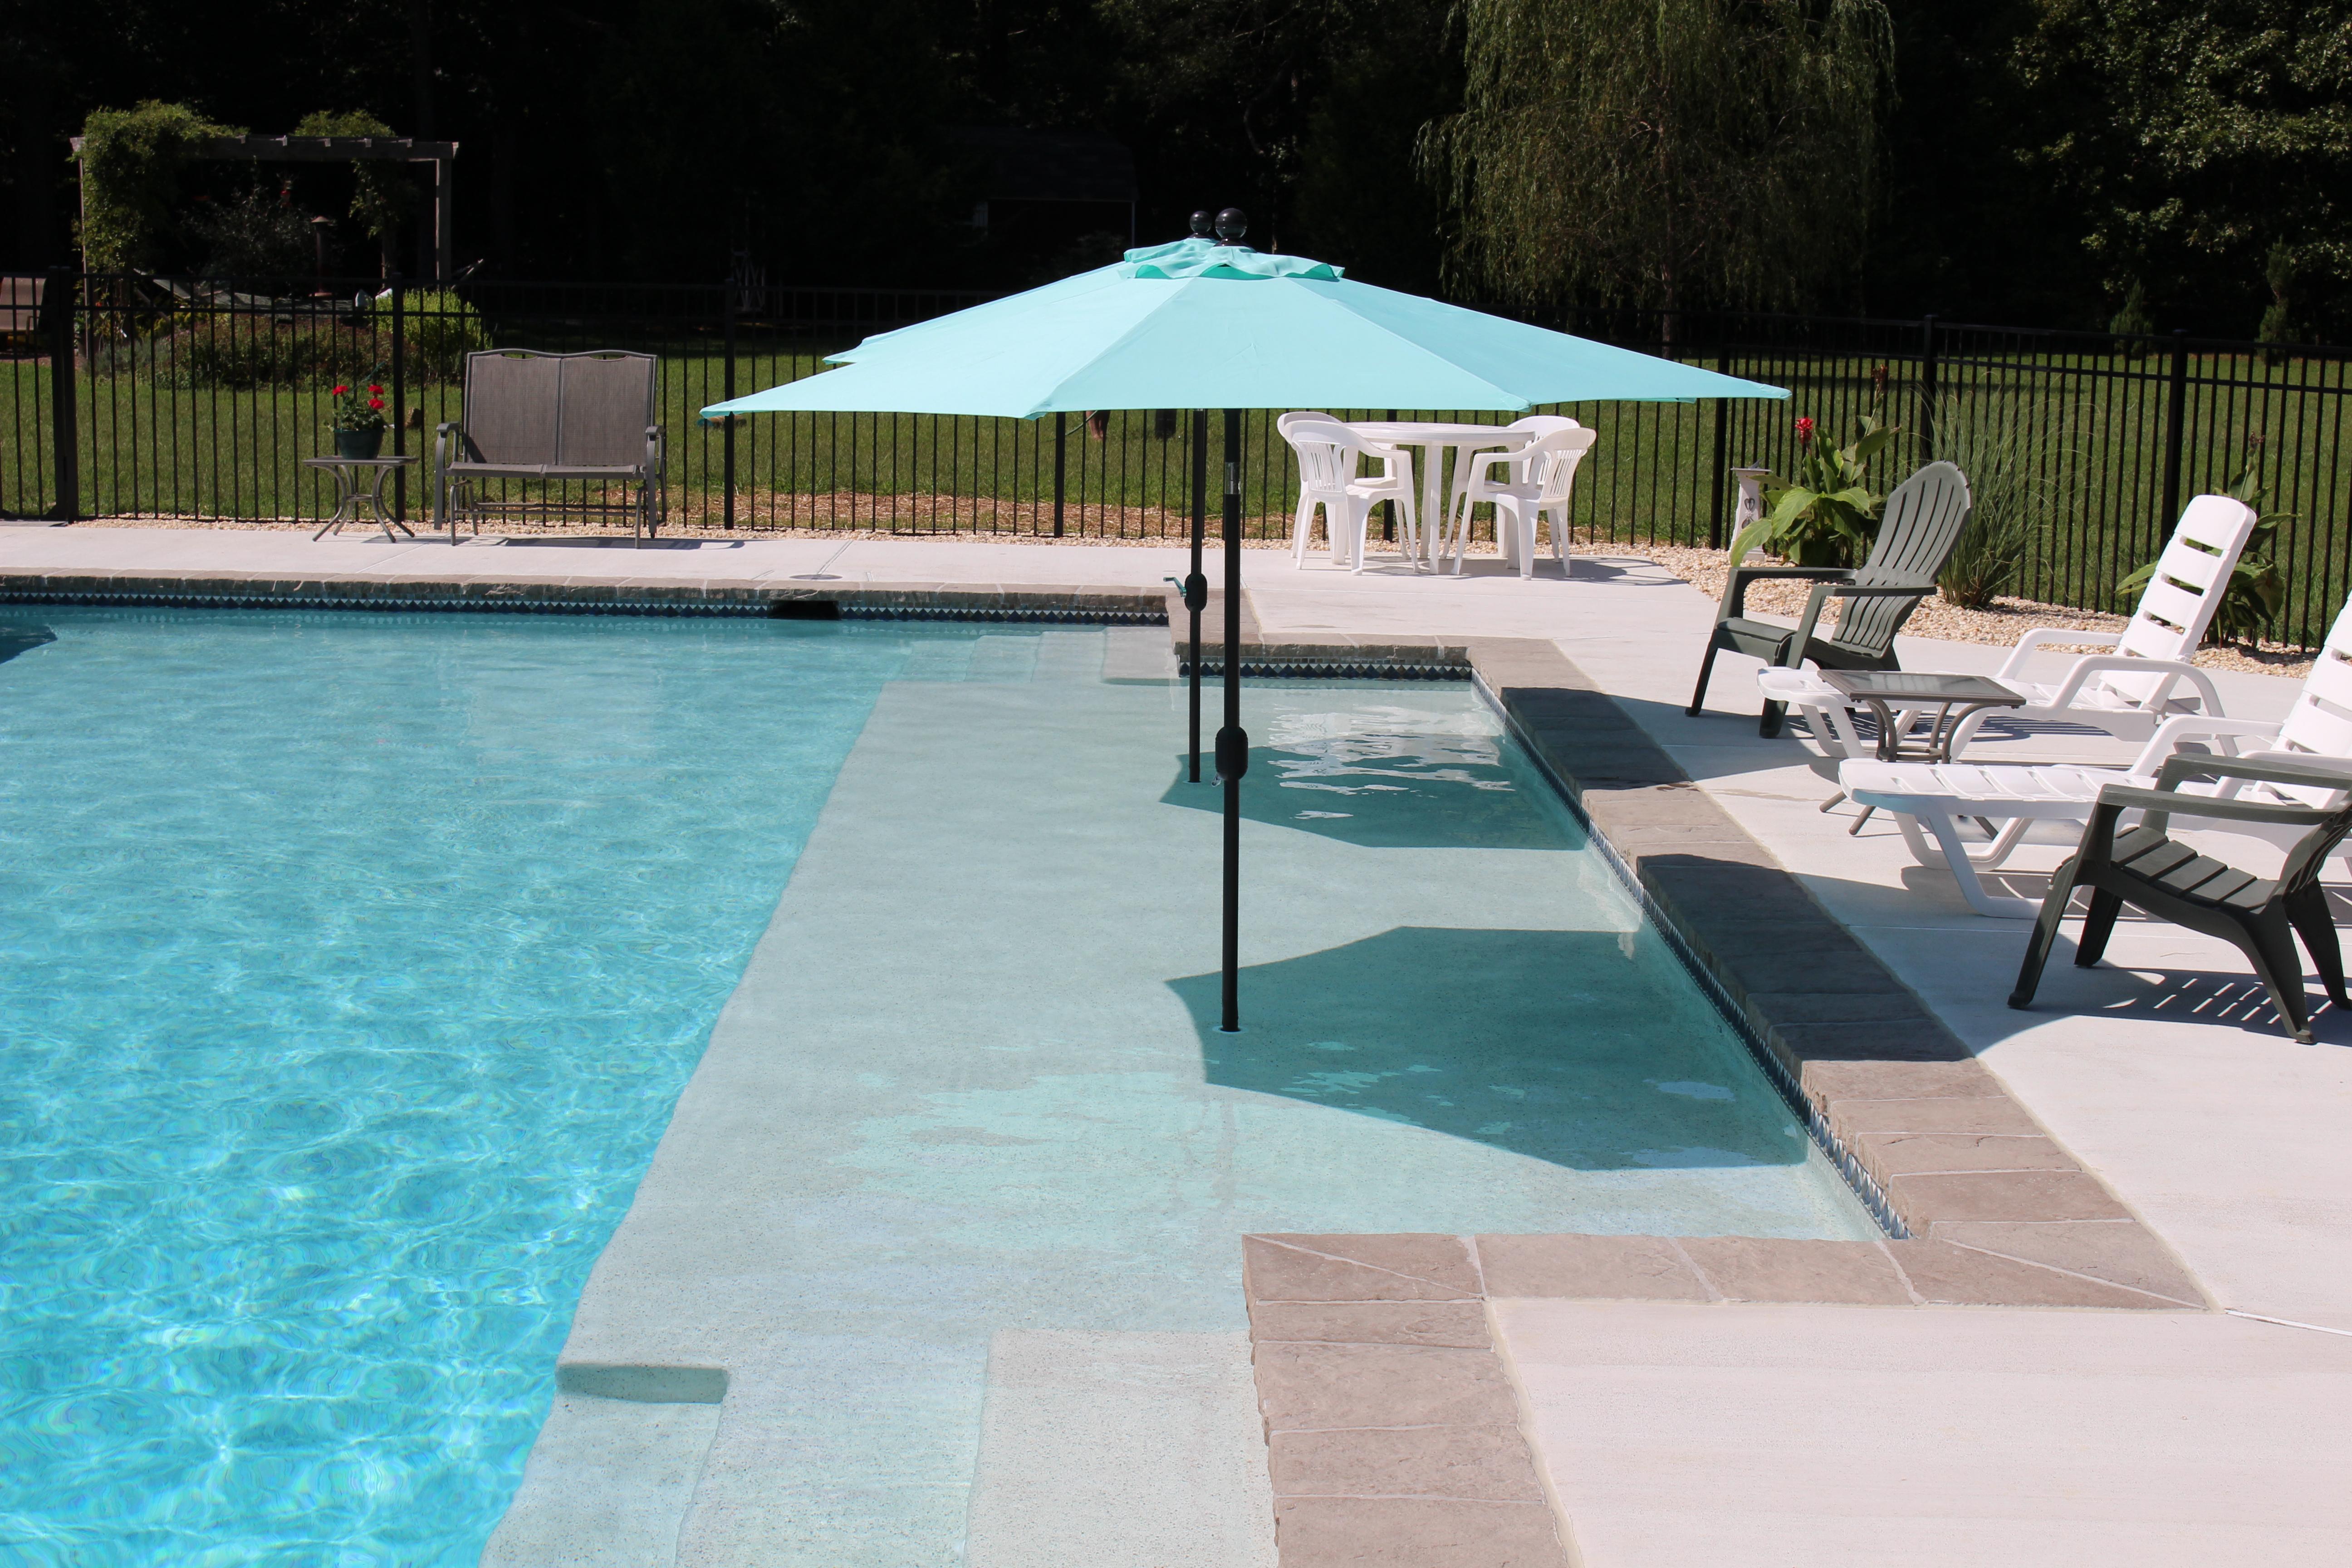 Swimming Pool With Sun Shelf The Pool Company Construction Pools Backyard Inground Pool Umbrellas Swimming Pools Backyard